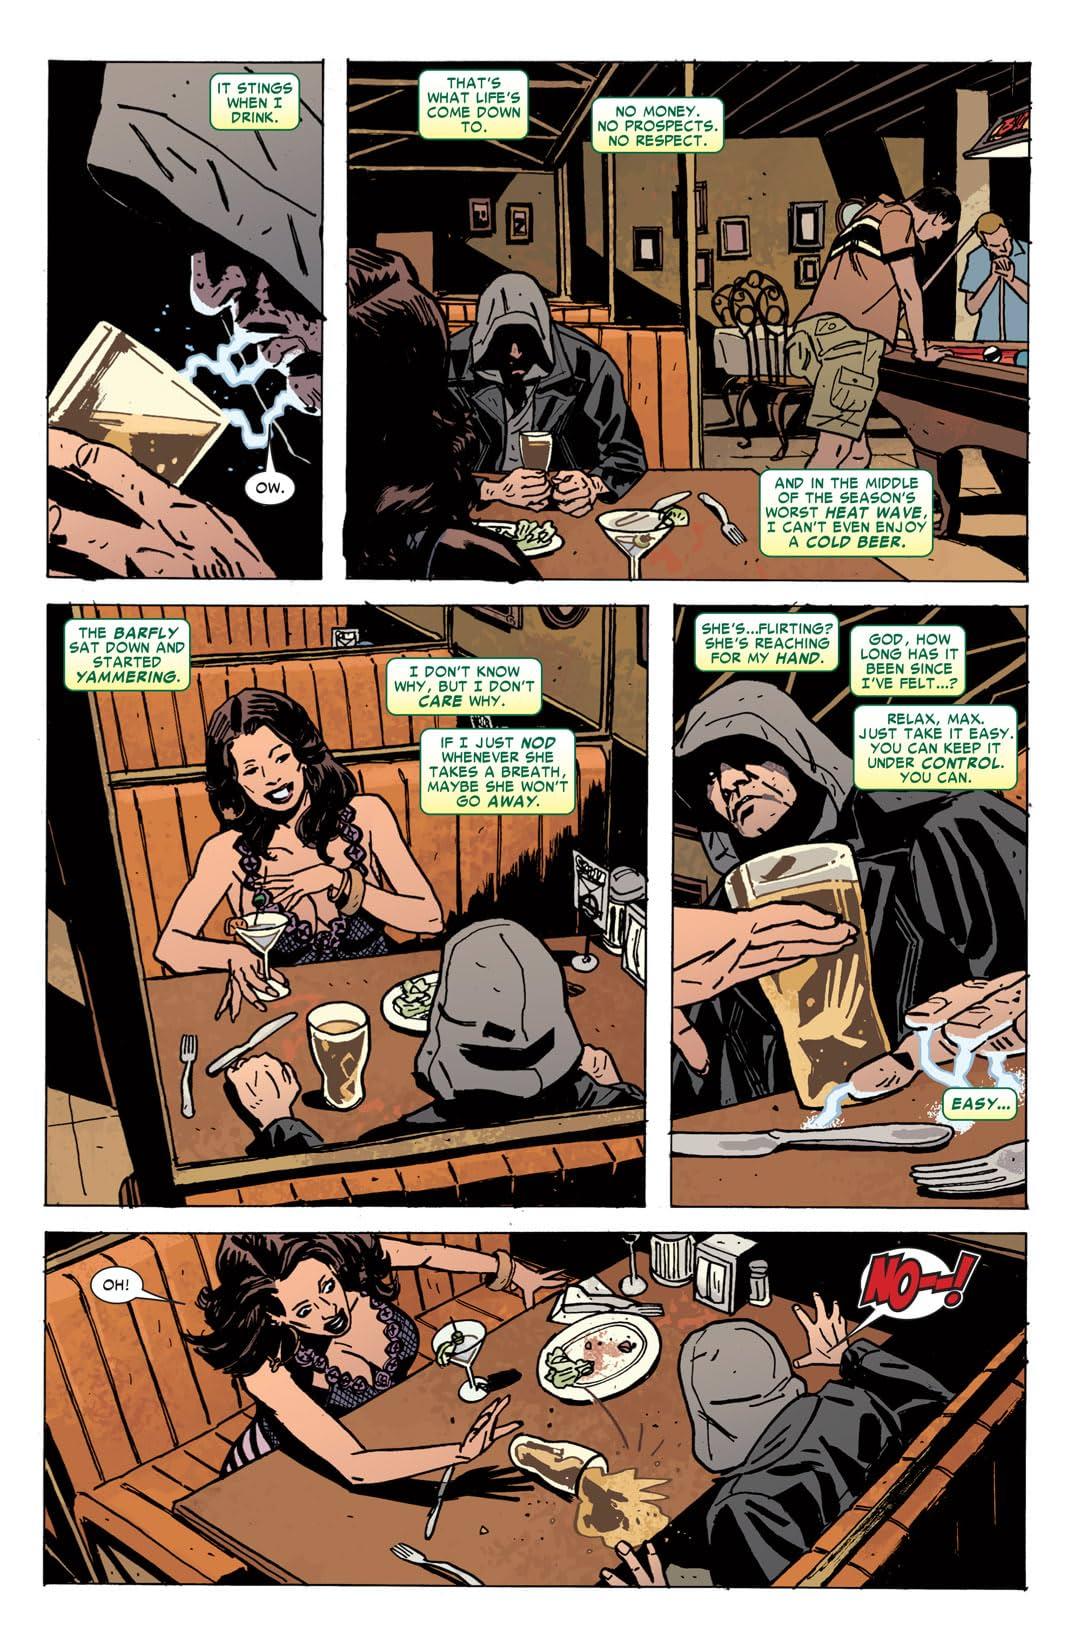 Spider-Man: The Gauntlet Vol. 1: Electro and Sandman